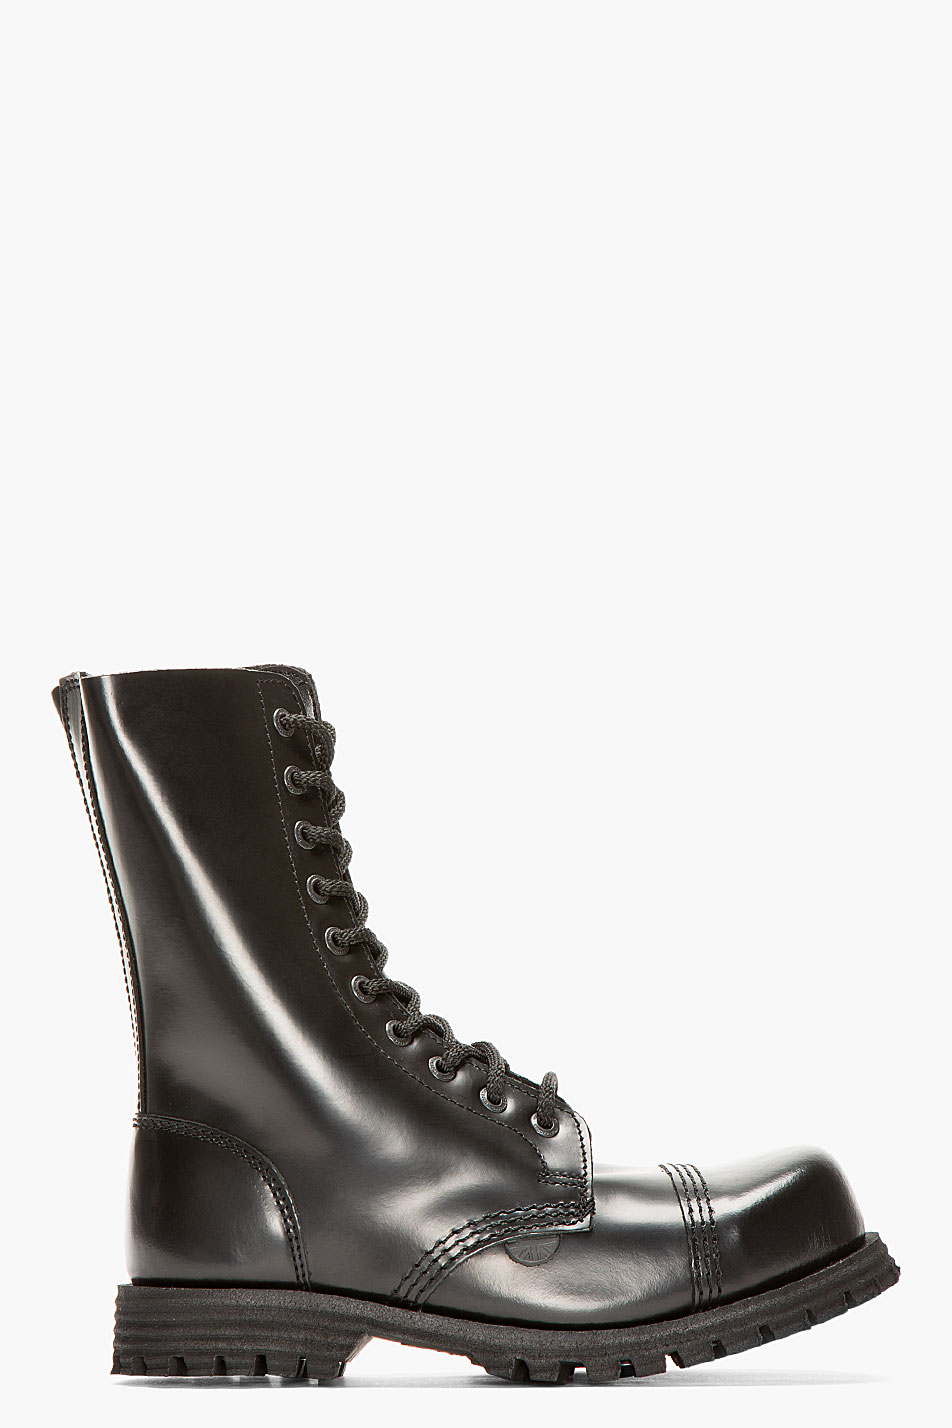 Lyst Underground Black Leather Commando 10 Eye Steelcap